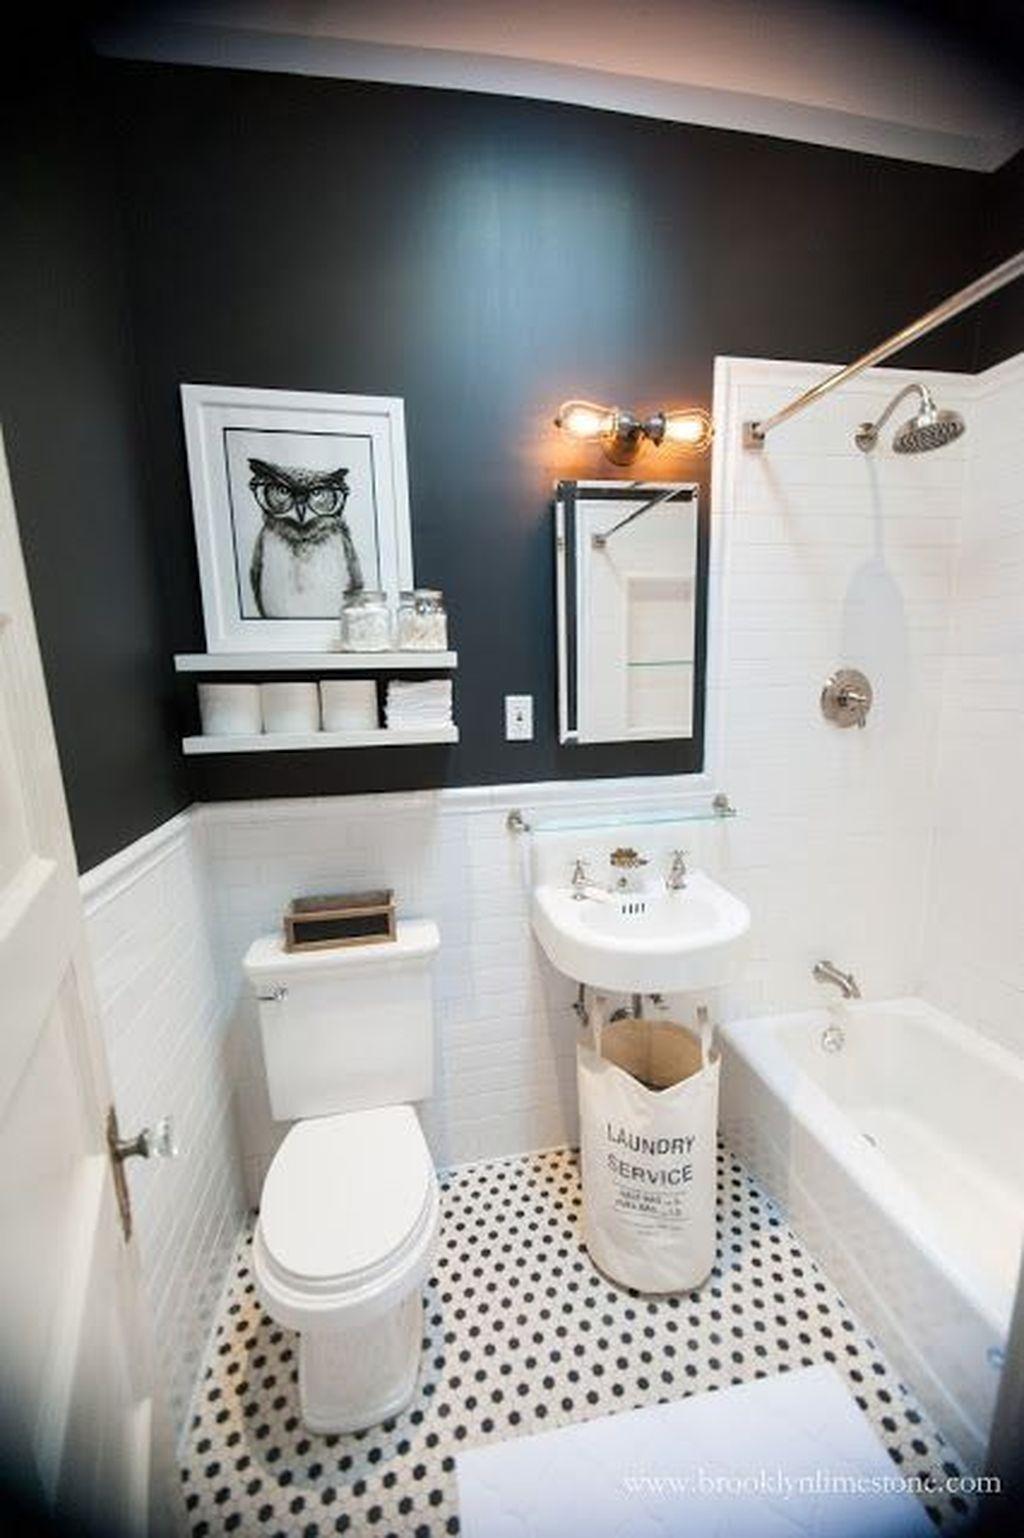 47 impressive small bathroom decor ideas on a budget bathroom rh pinterest com